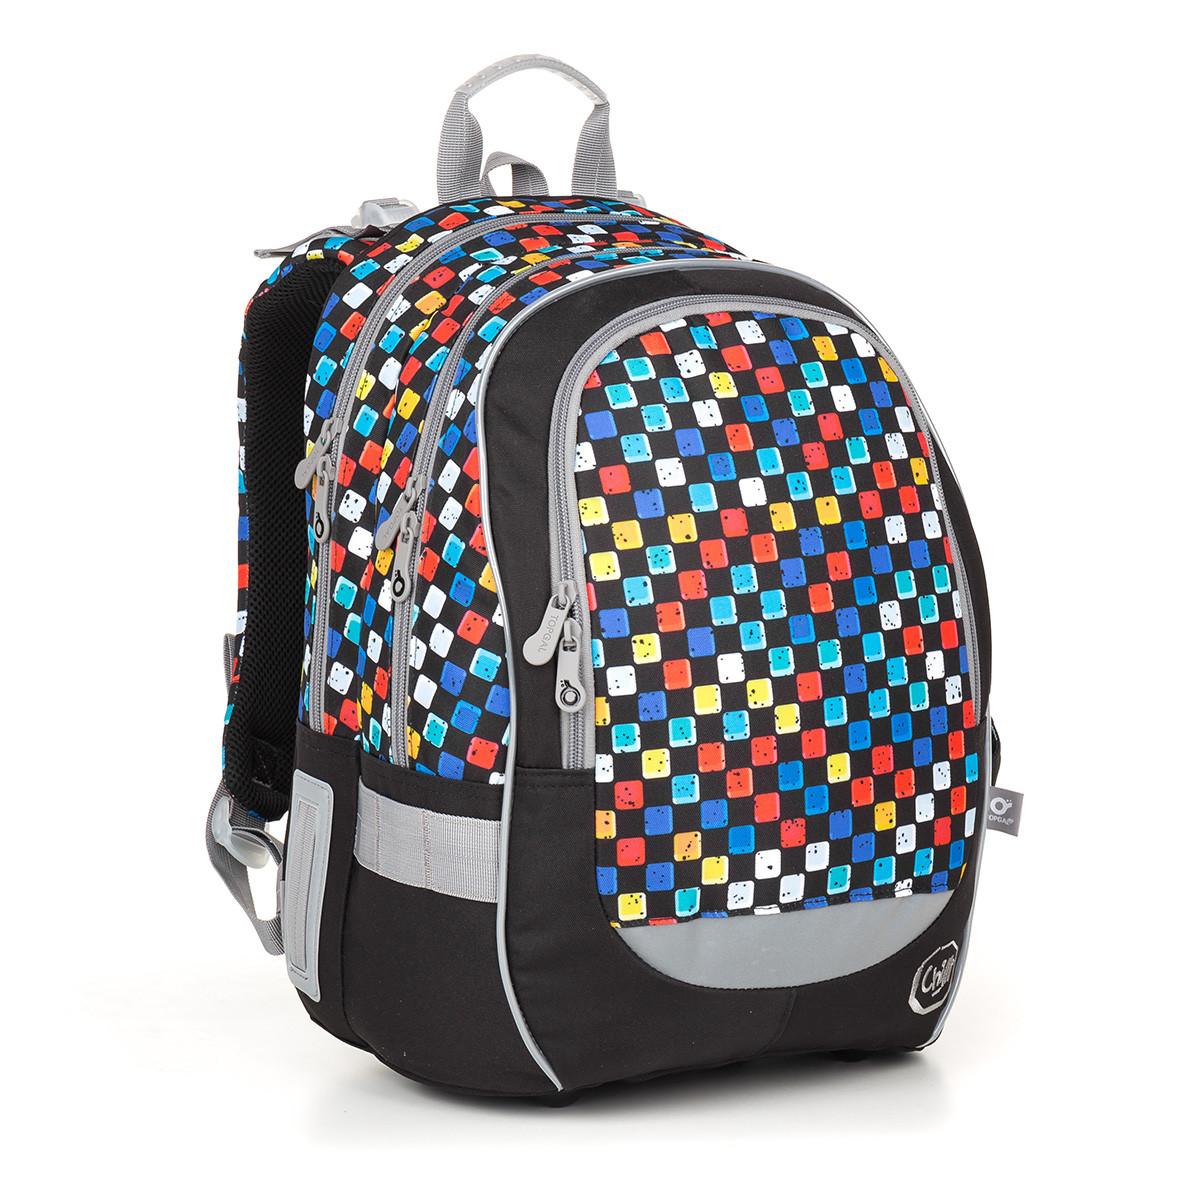 f407a45401 Školní batoh Topgal - CODA18020 B